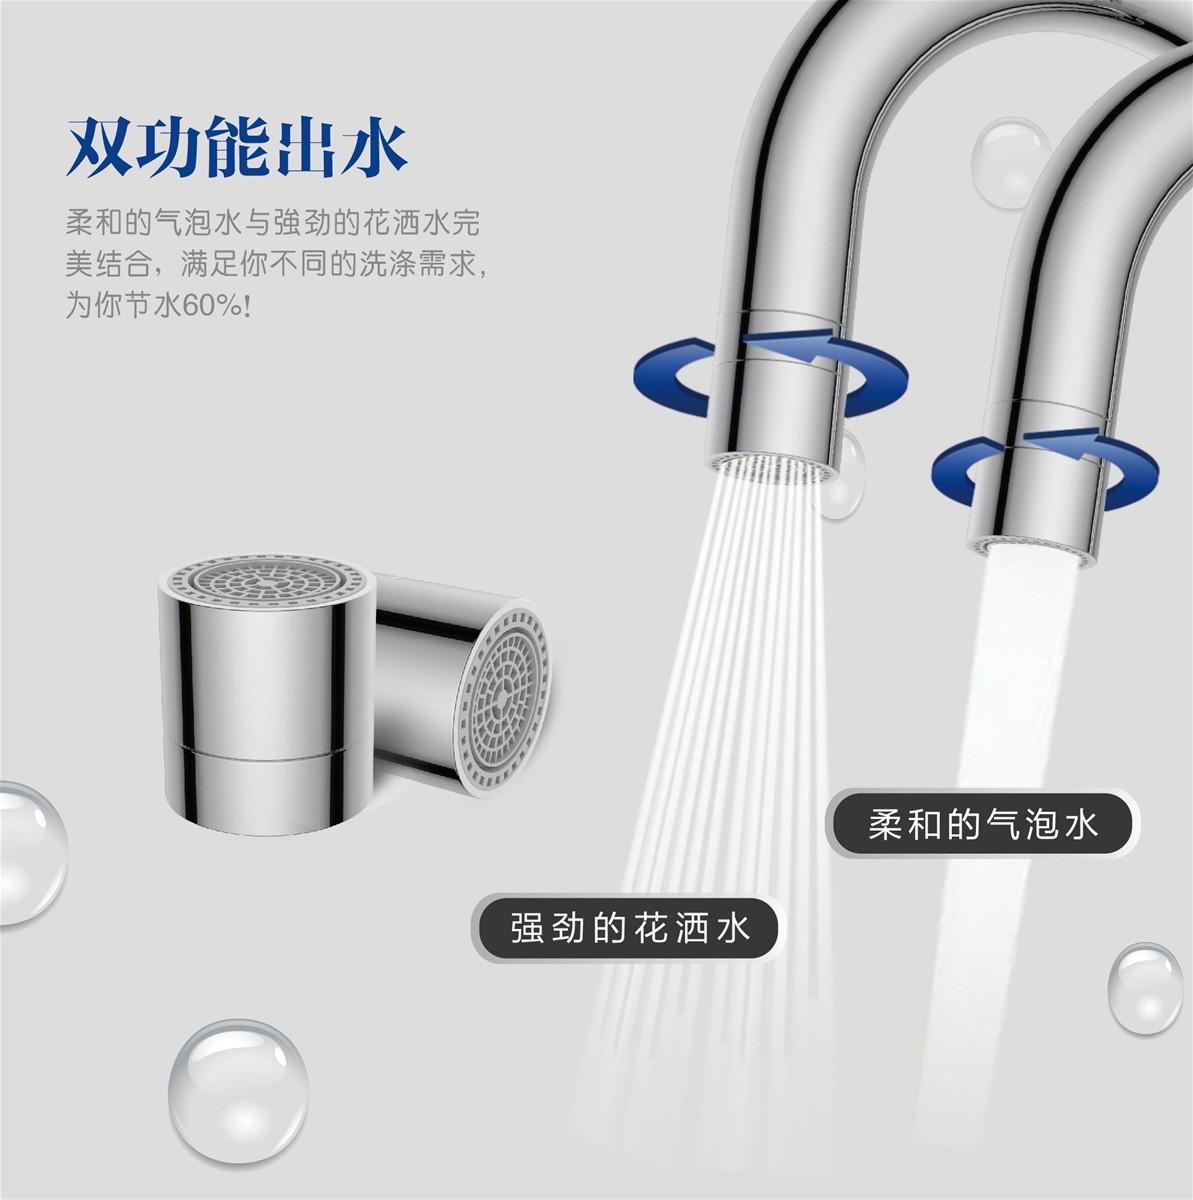 Dual-function Water saving faucet aerator/faucet tap